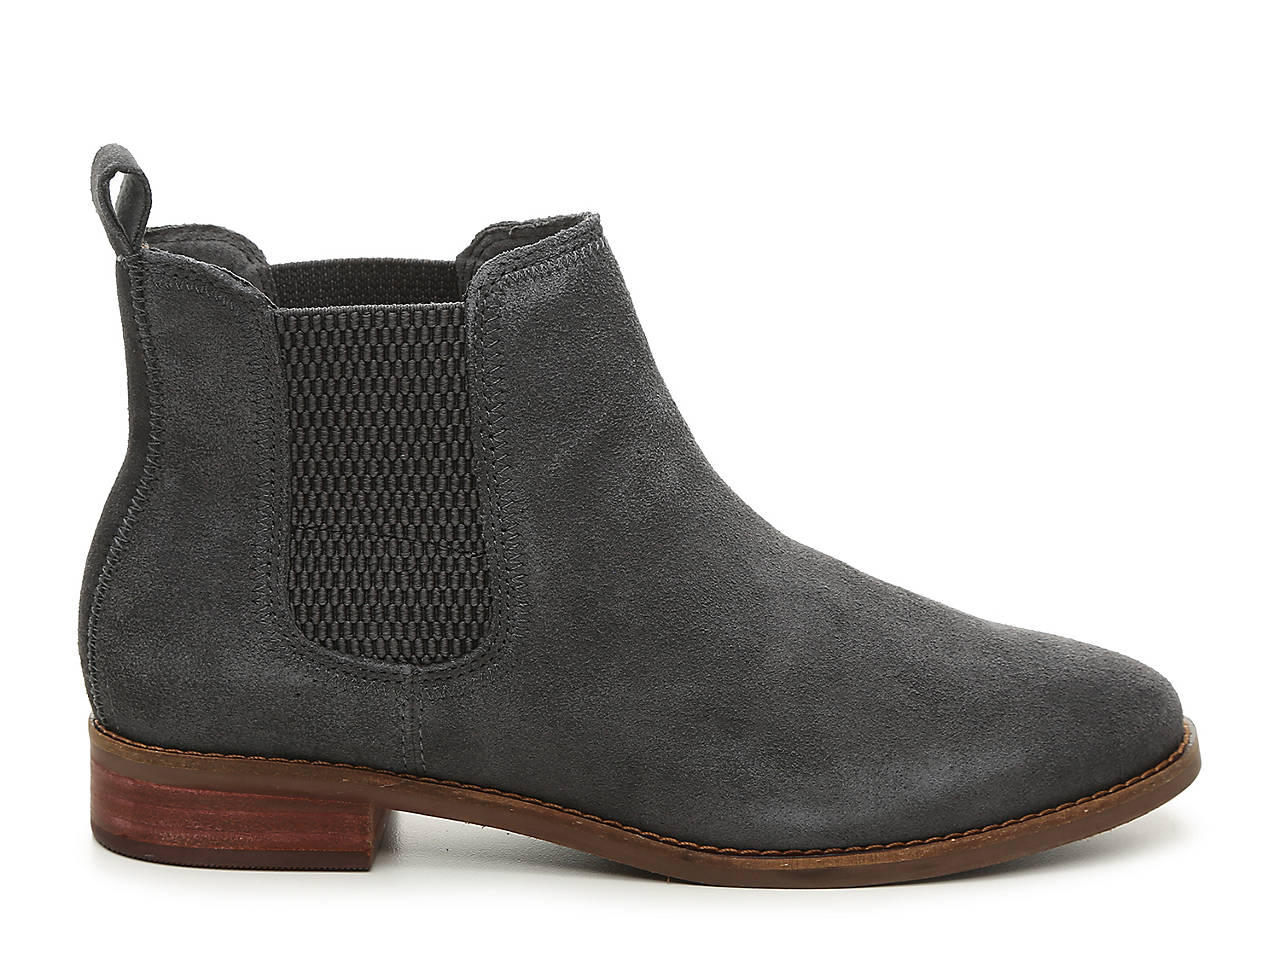 54a67467a41ef1 TOMS Ella Chelsea Boot Women s Shoes